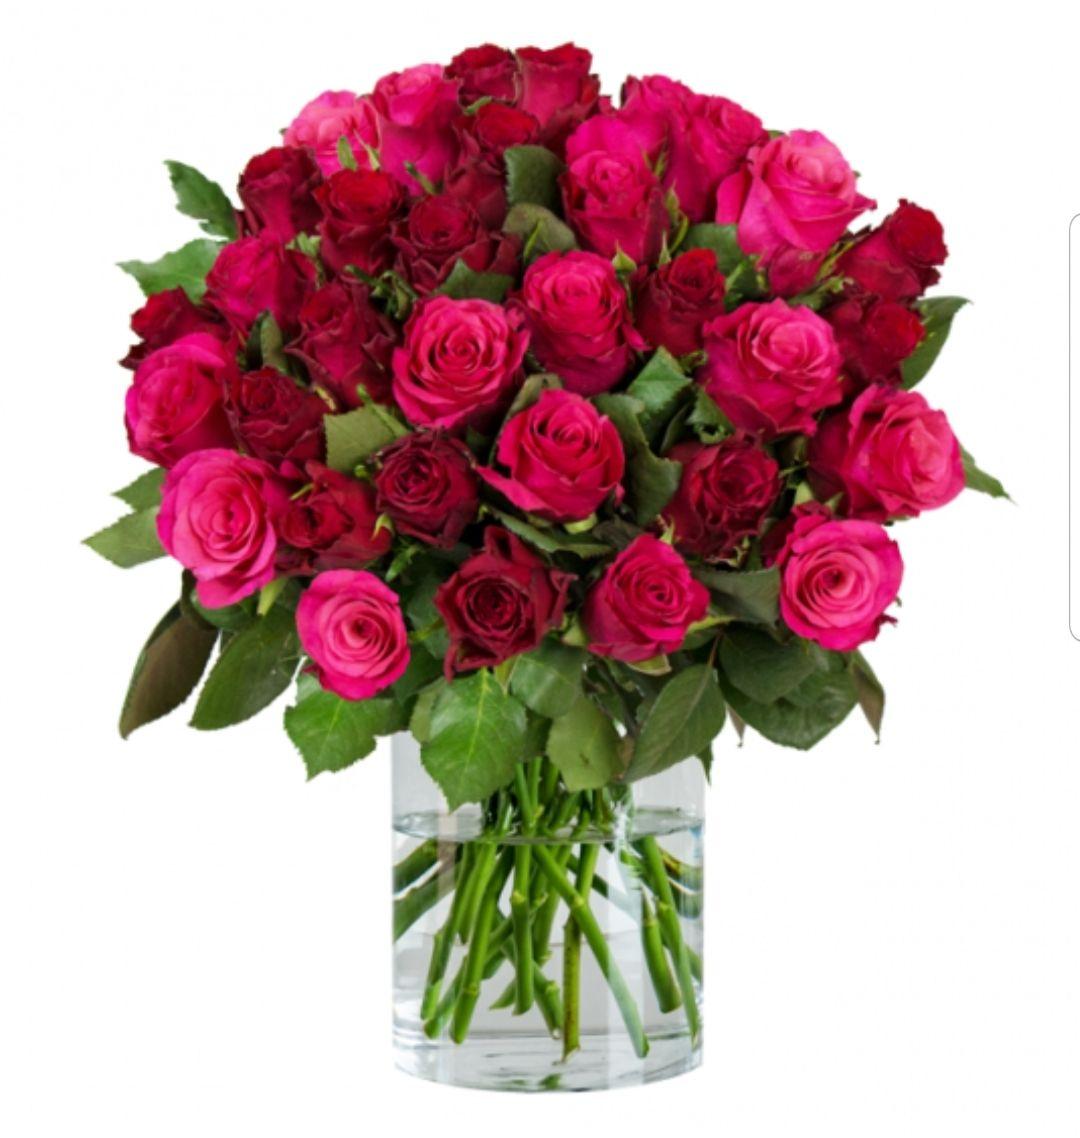 [BlumeIdeal] 35 Romantic Rosen